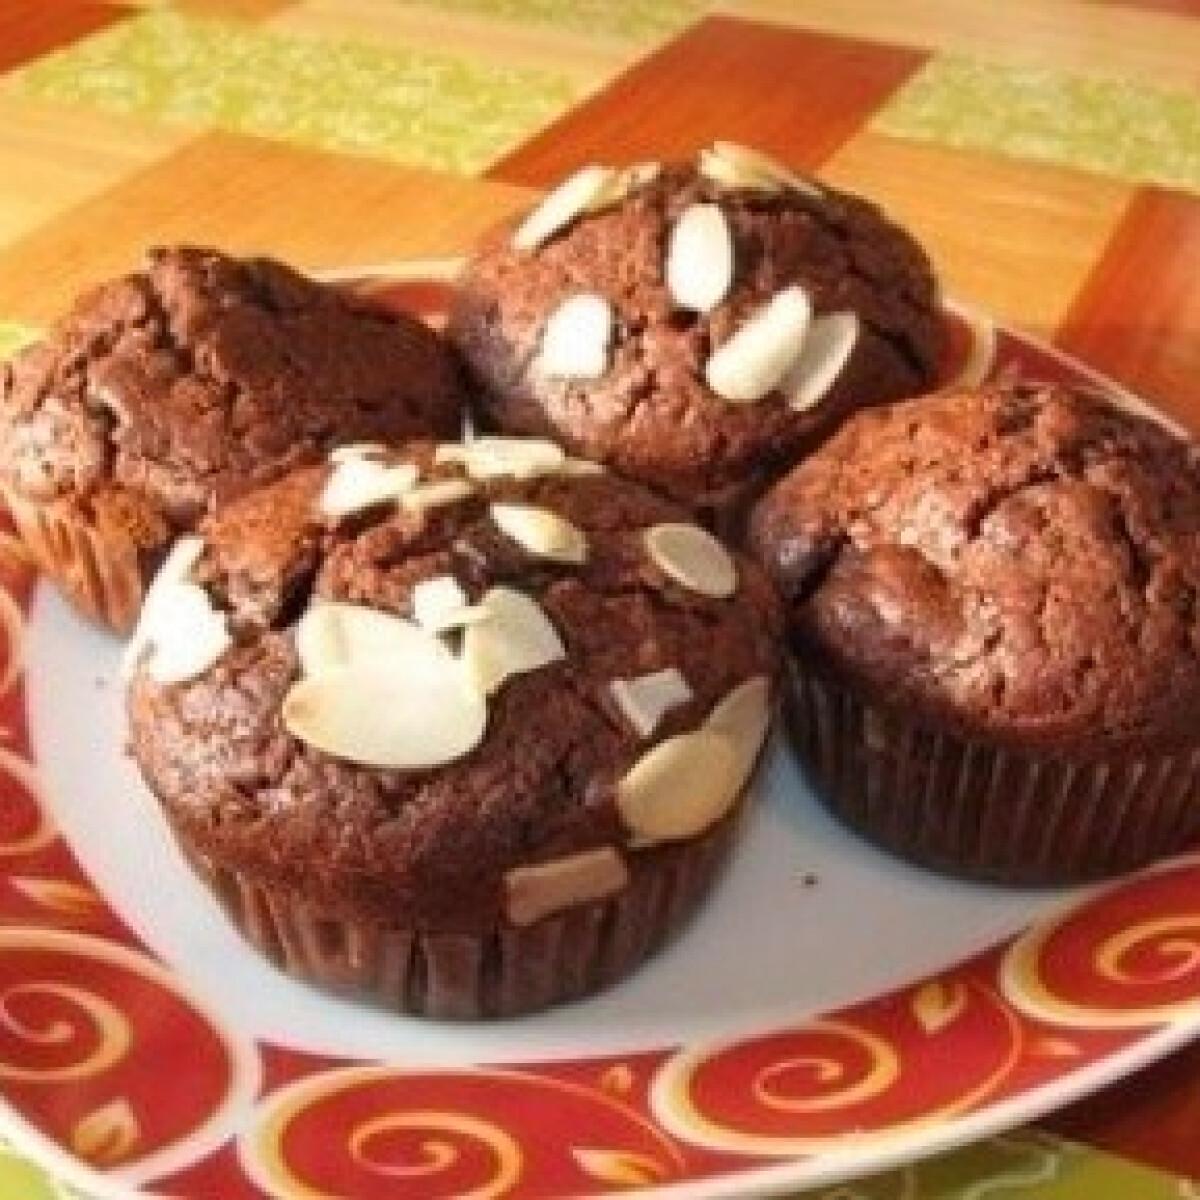 Meggyes-csokis muffin 3.